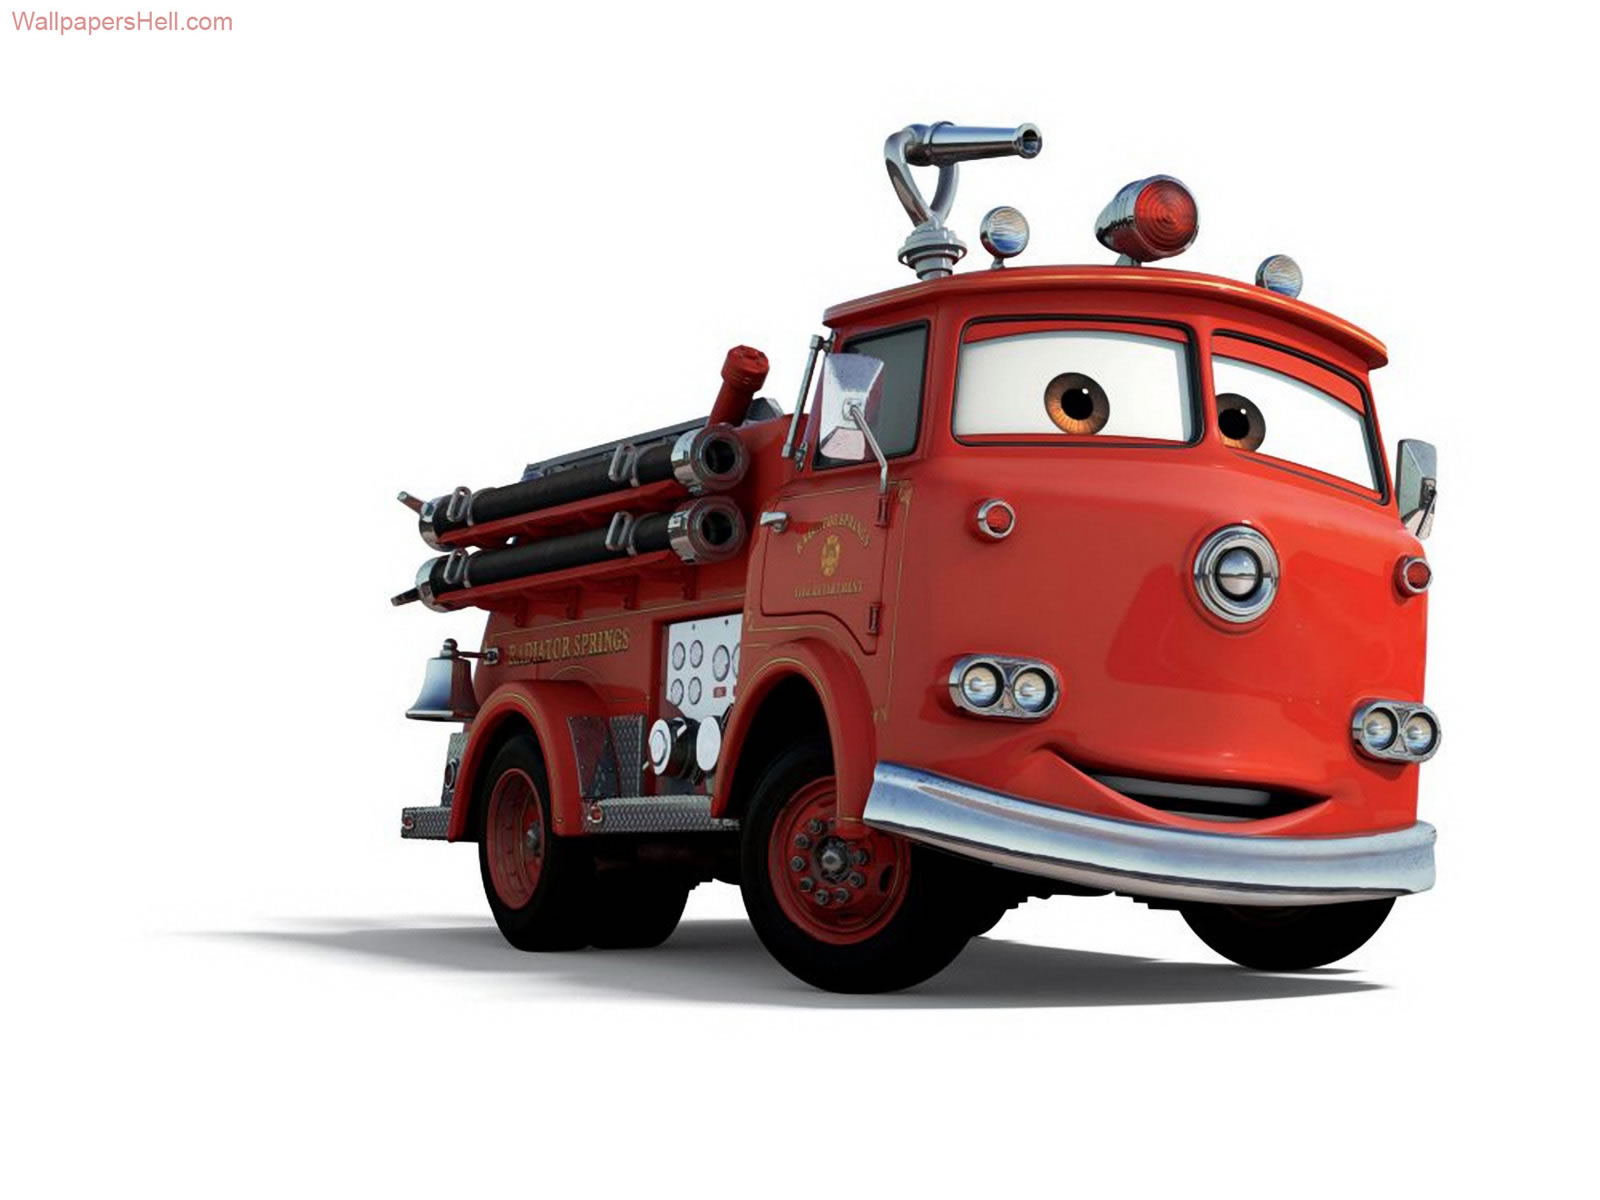 cars-disney-023-1600ii8.jpg